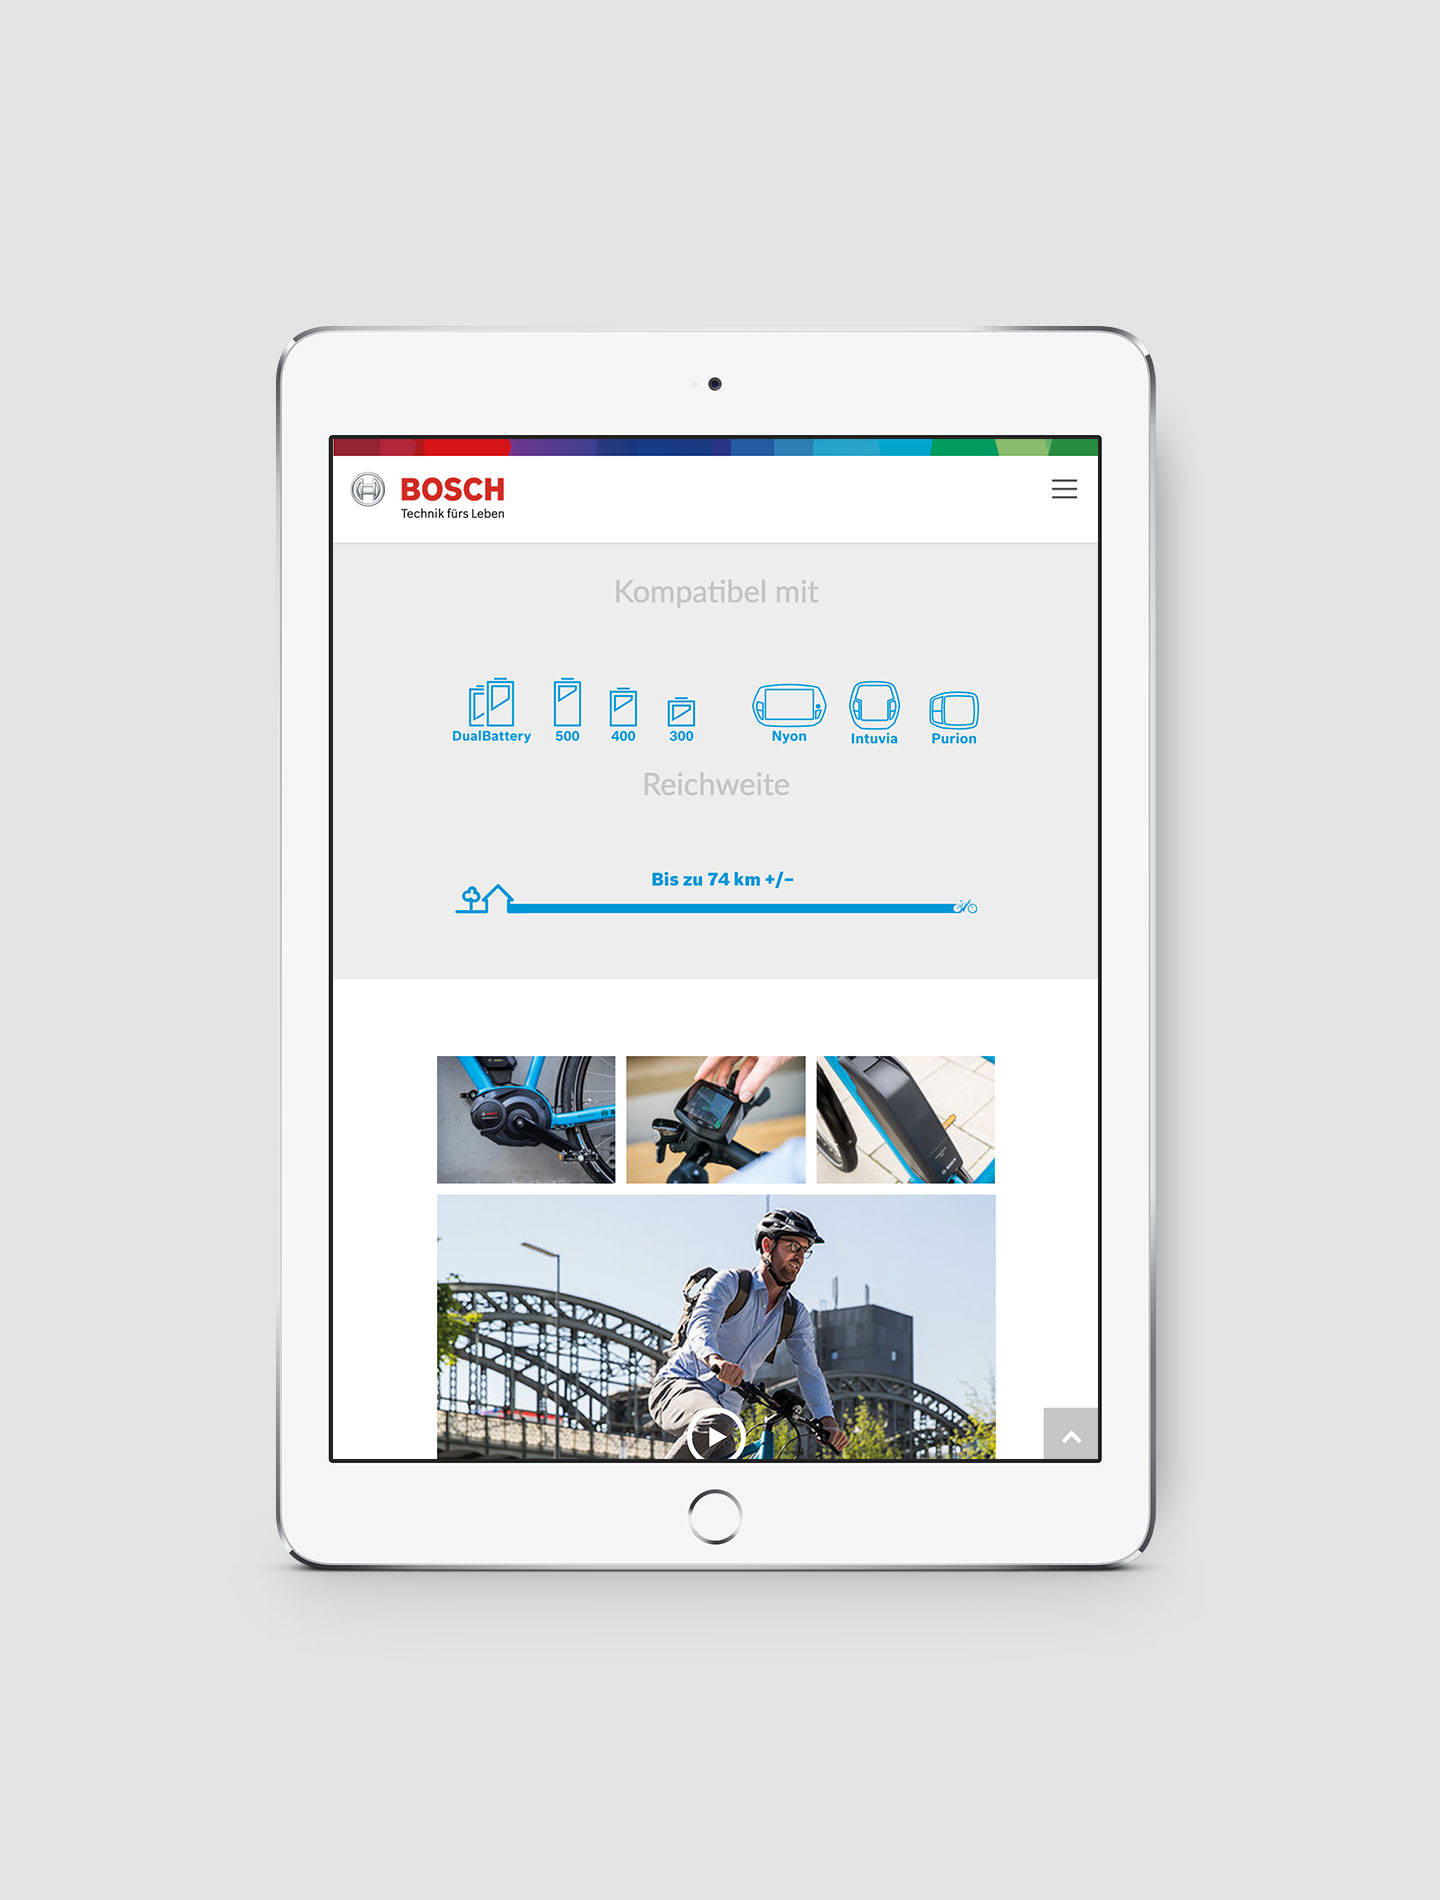 bosch-eBike_2018_tablet